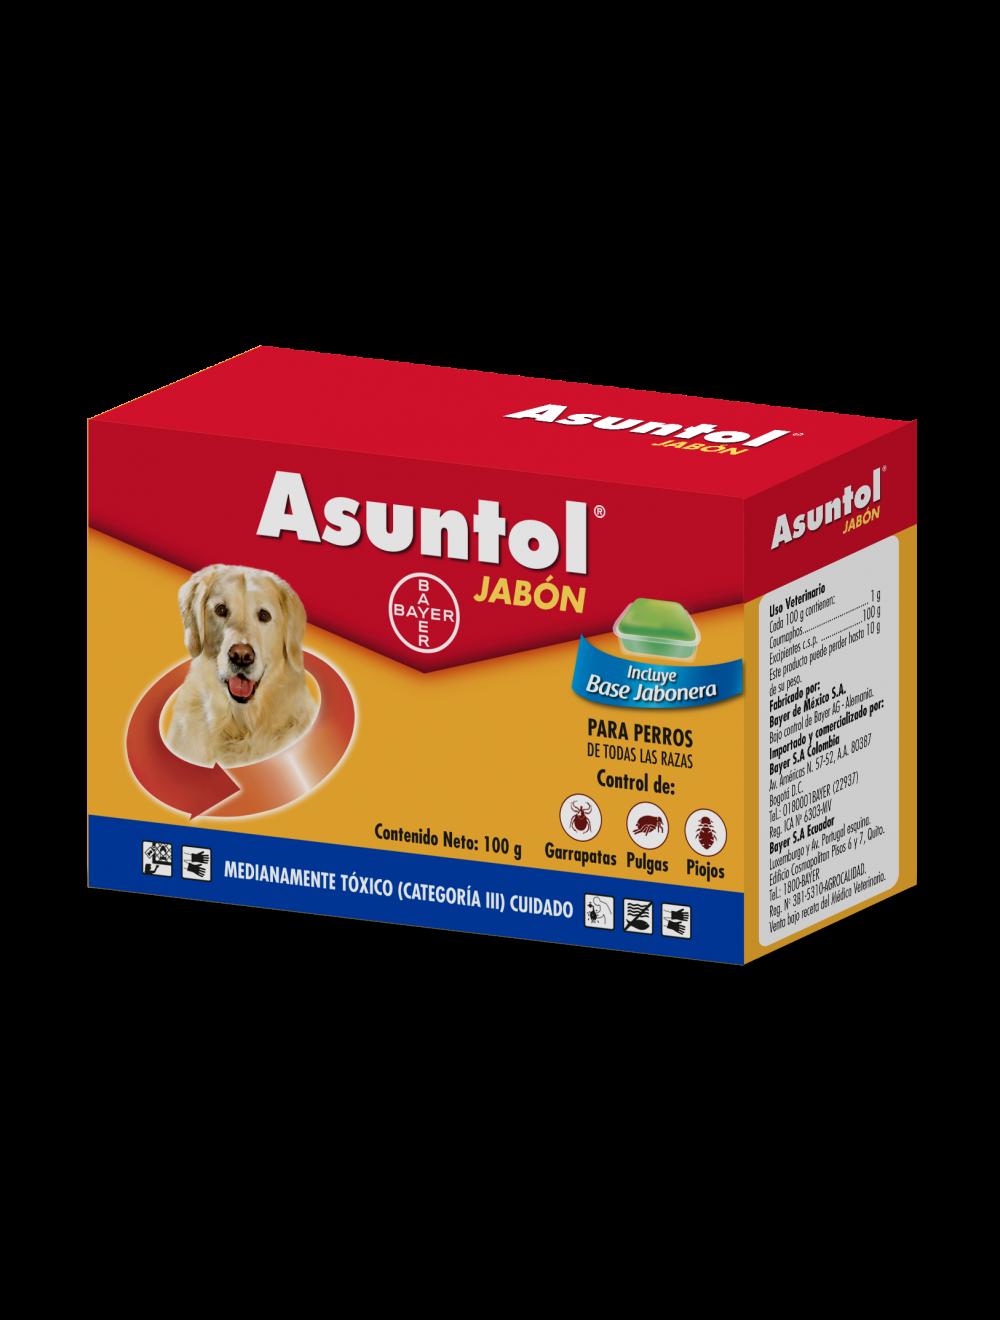 Asuntol Jabón para Perros 100 g - Ciudaddemascotas.com